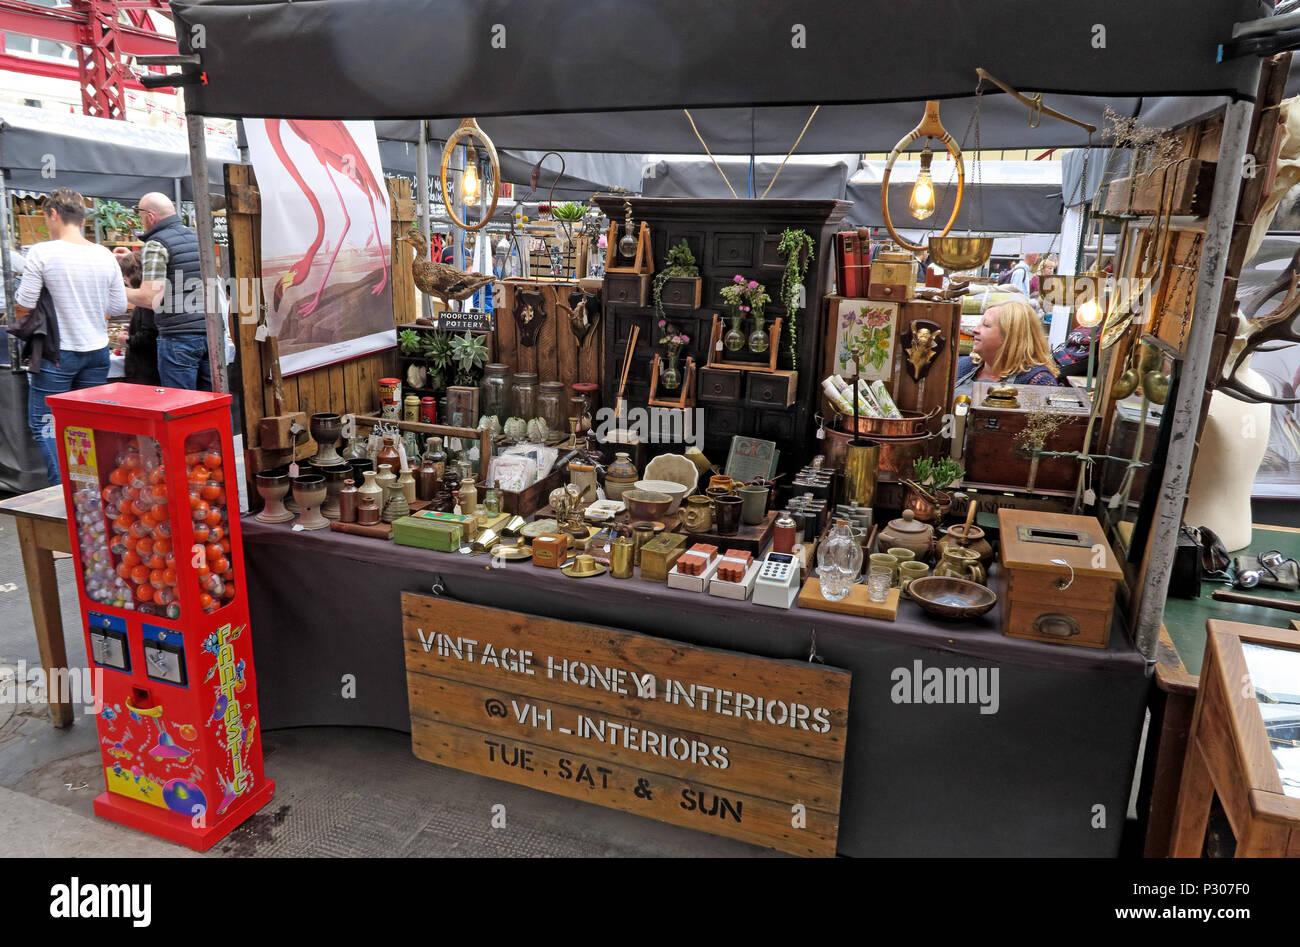 GoTonysmith,@HotpixUK,Trafford,Cheshire,town,centre,shopping,retail,Vintage